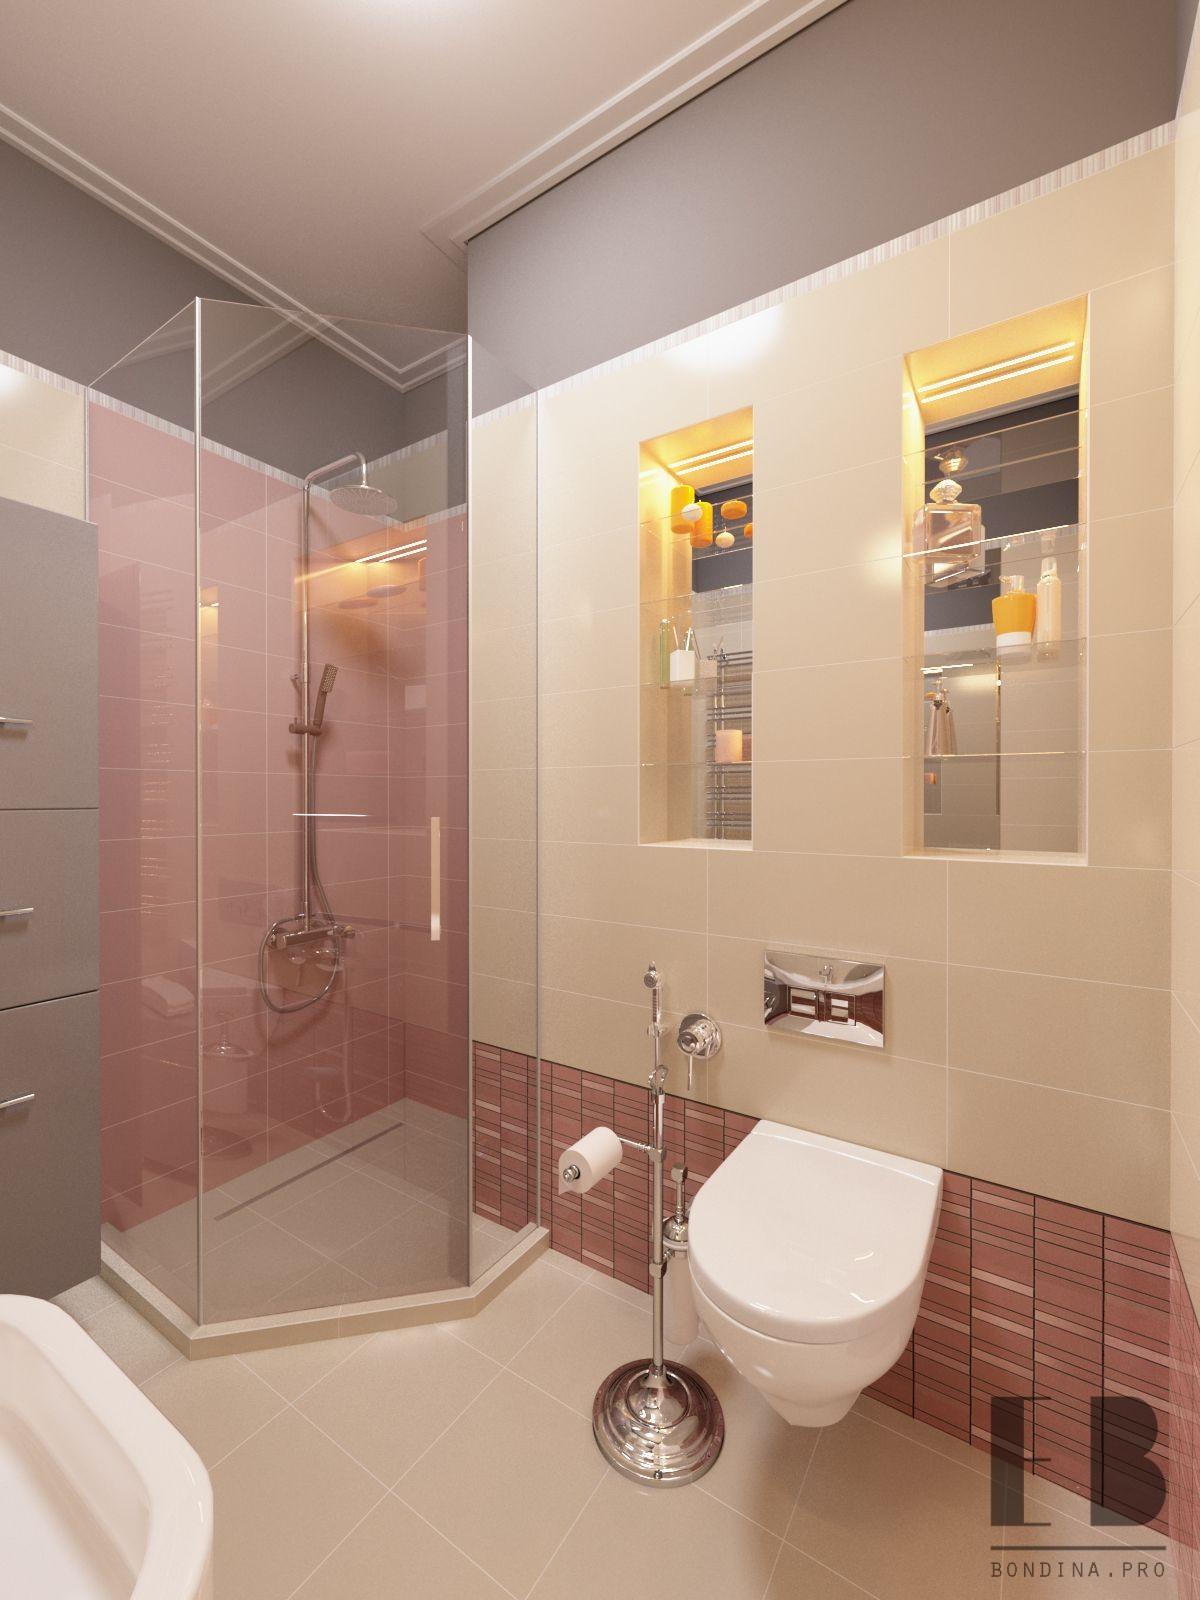 Modern interior style bathroom